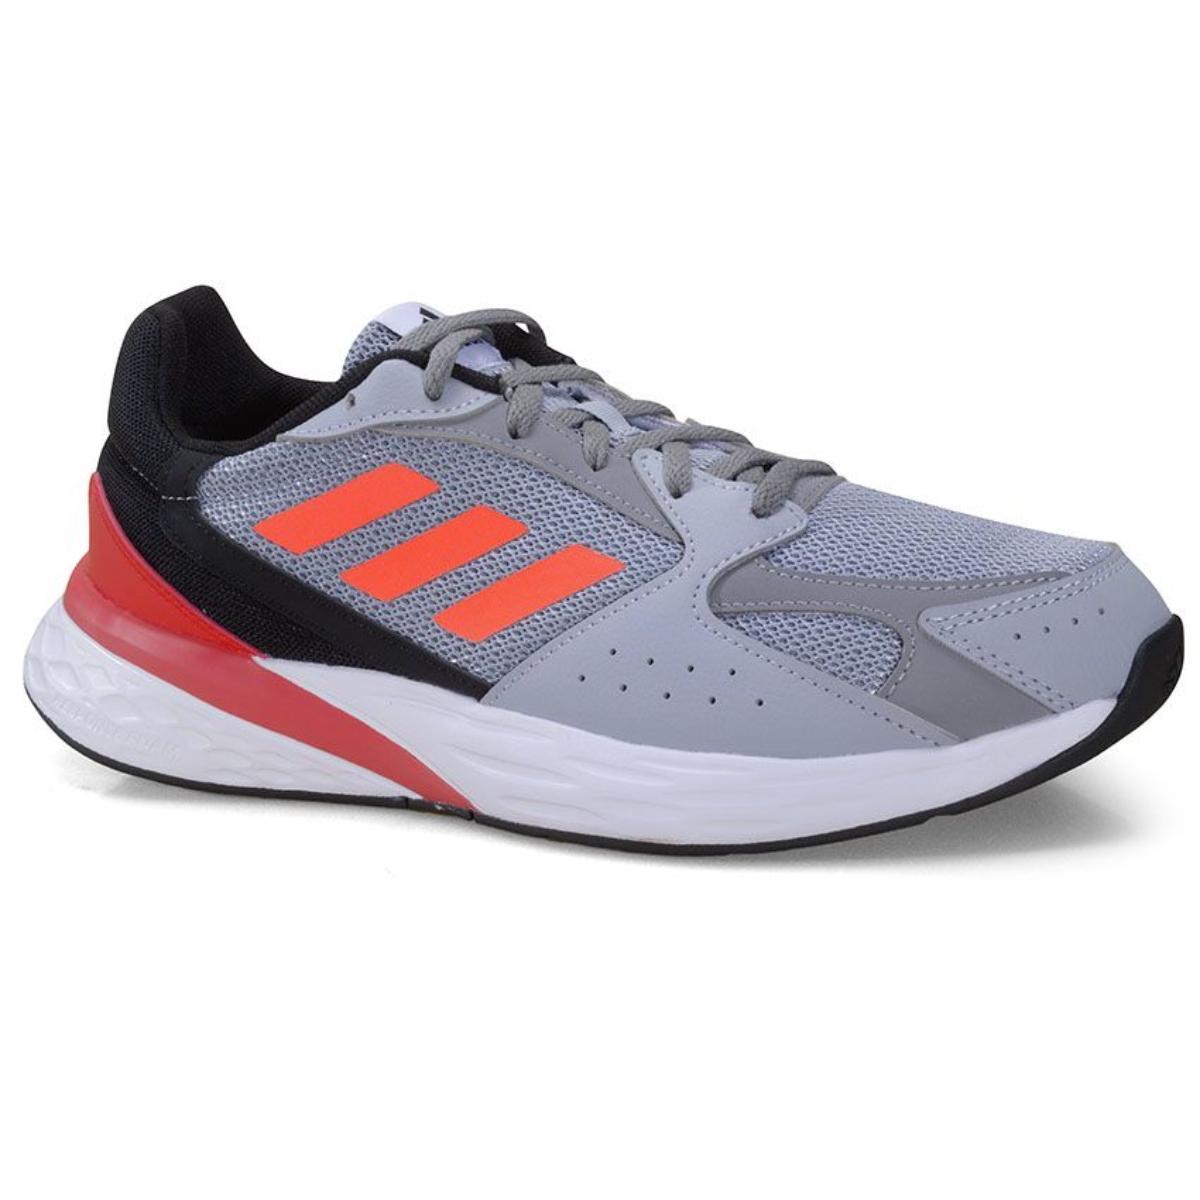 Tênis Masculino Adidas Fy5956 Response Run Cinza/preto/vermelho